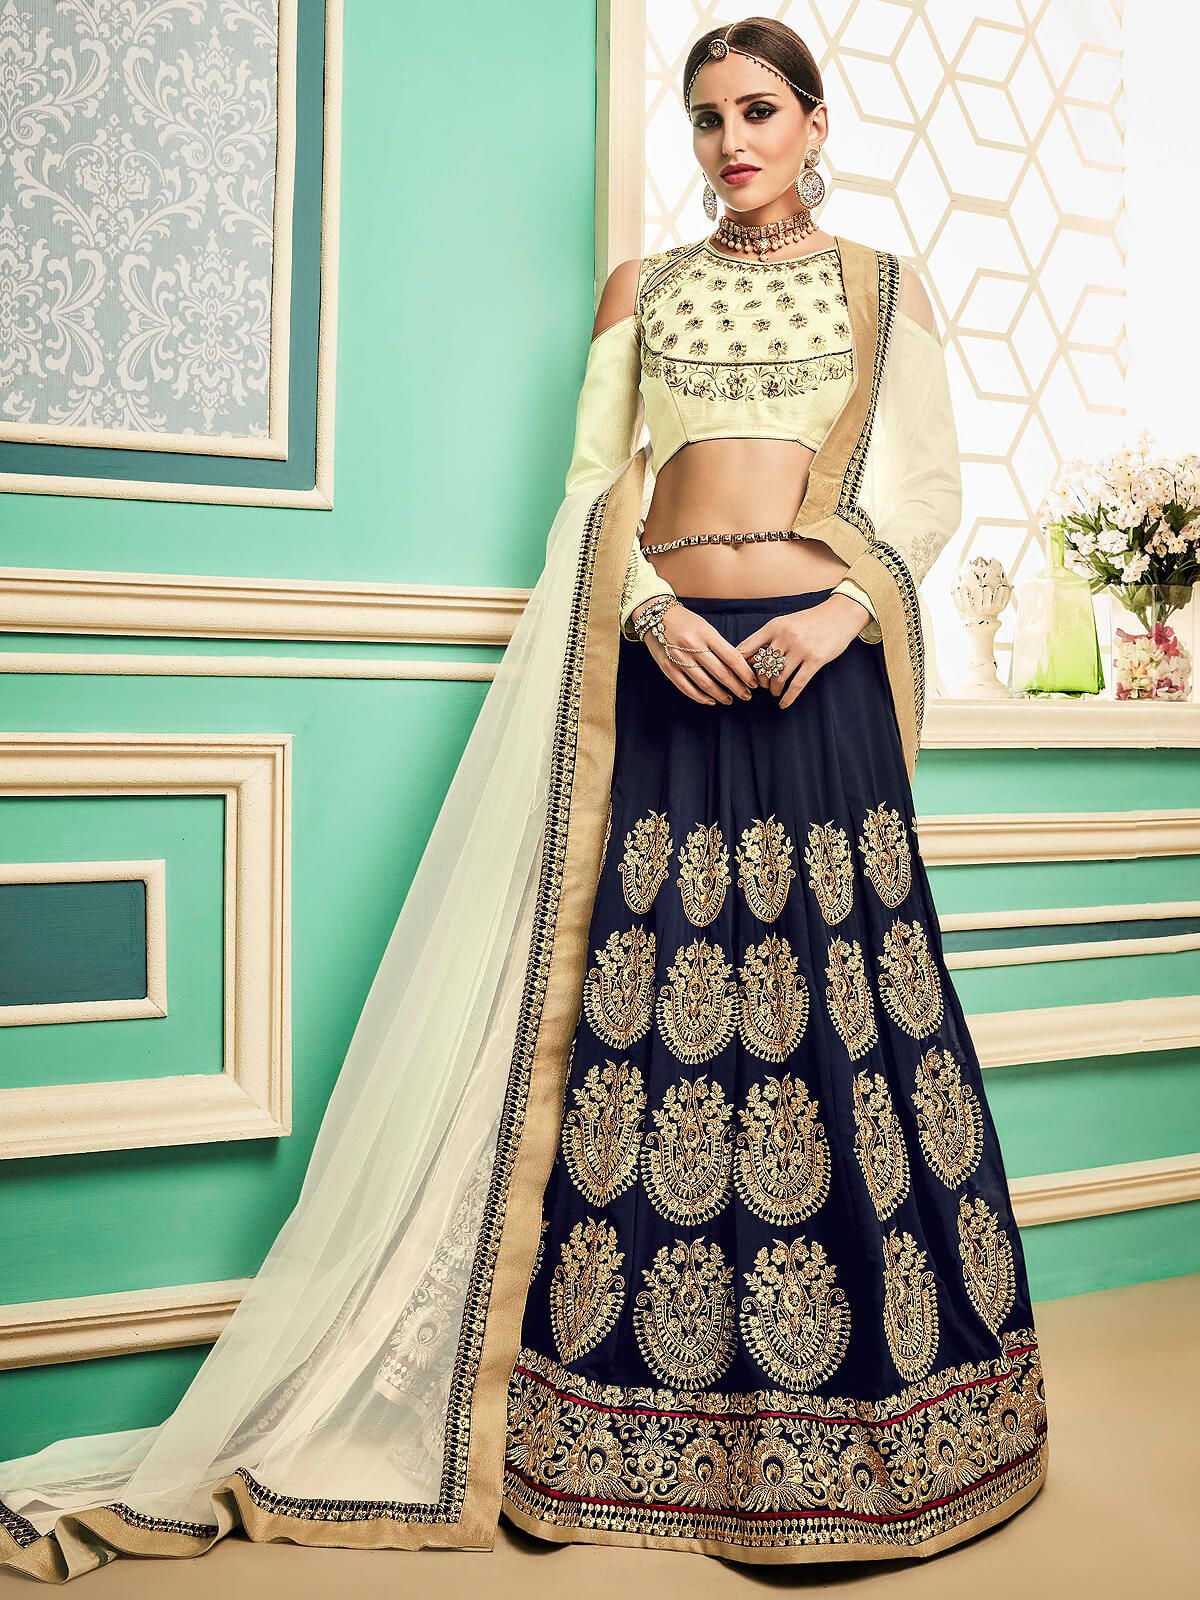 9d29d112924 Captivating off white and navy blue santoon party wear designer lehnega  choli. Having fabric santoon